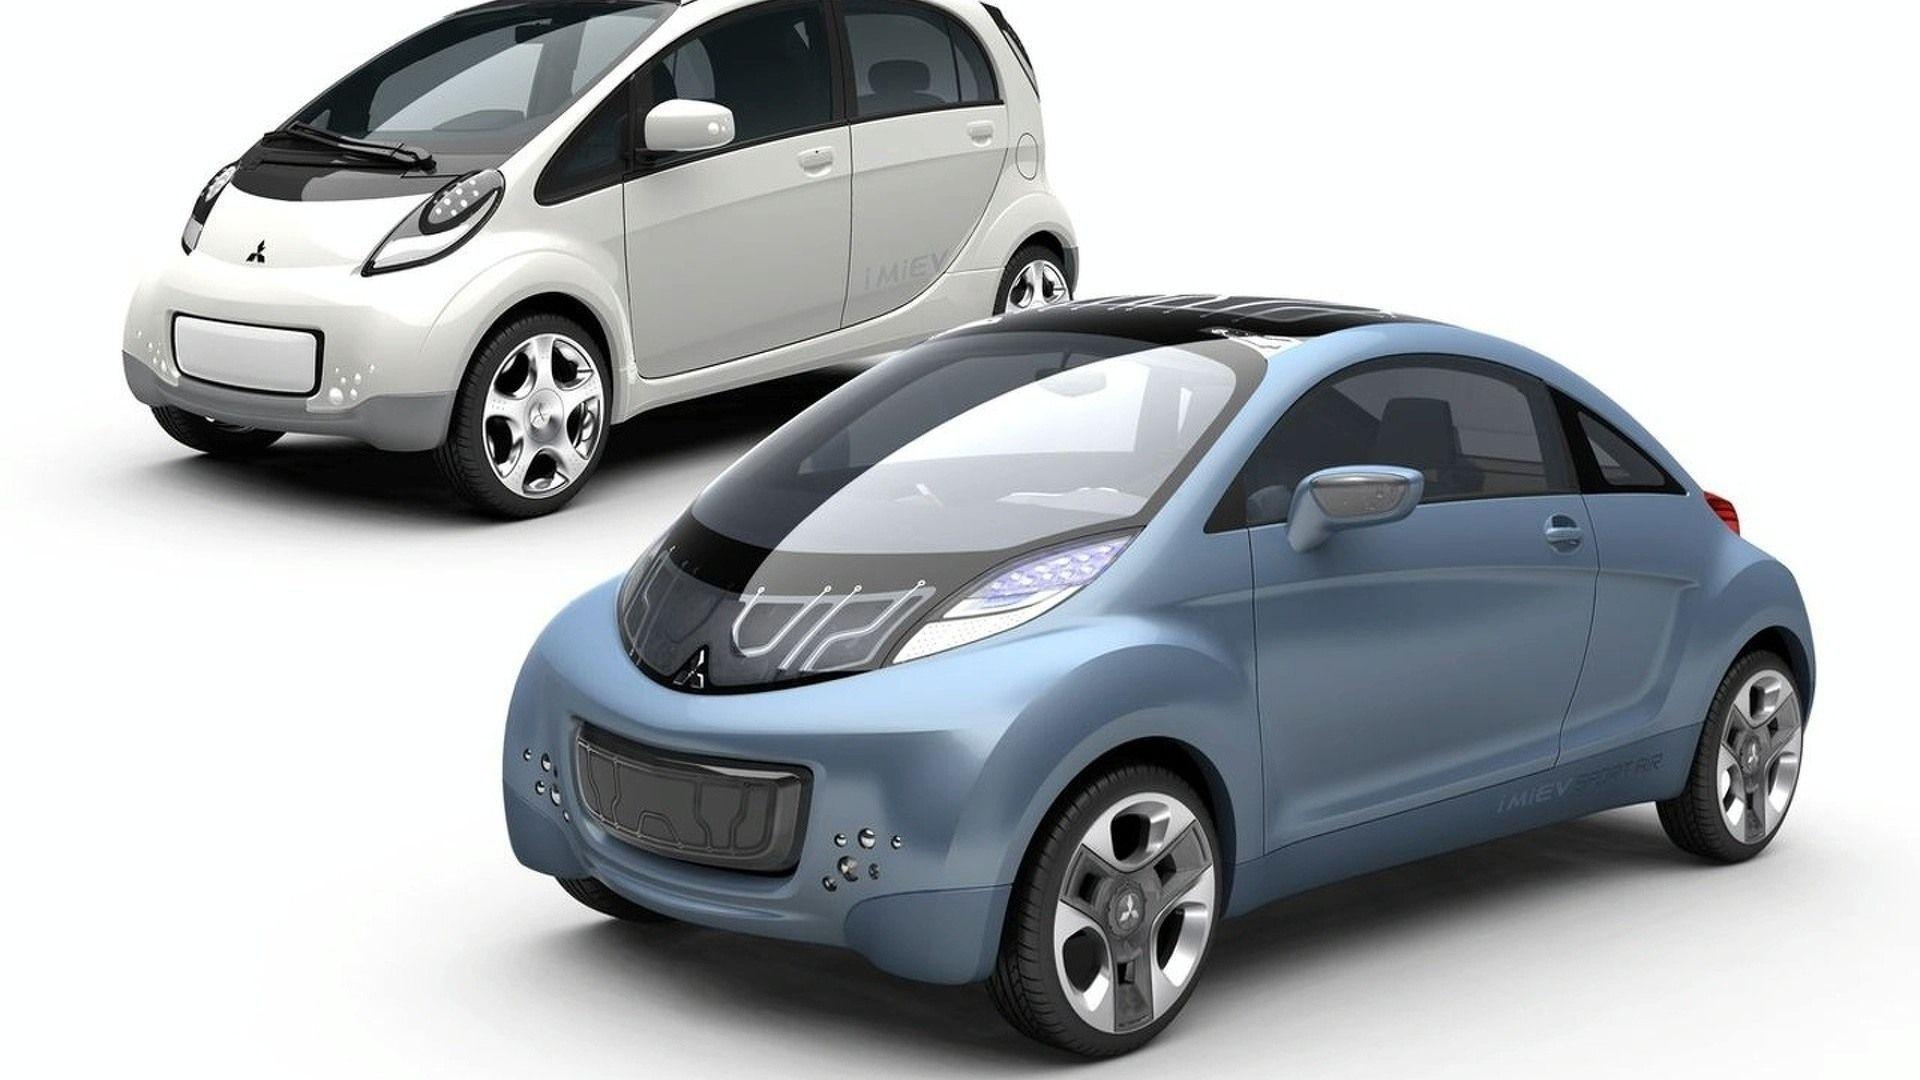 New 2020 Mitsubishi I Miev Concept